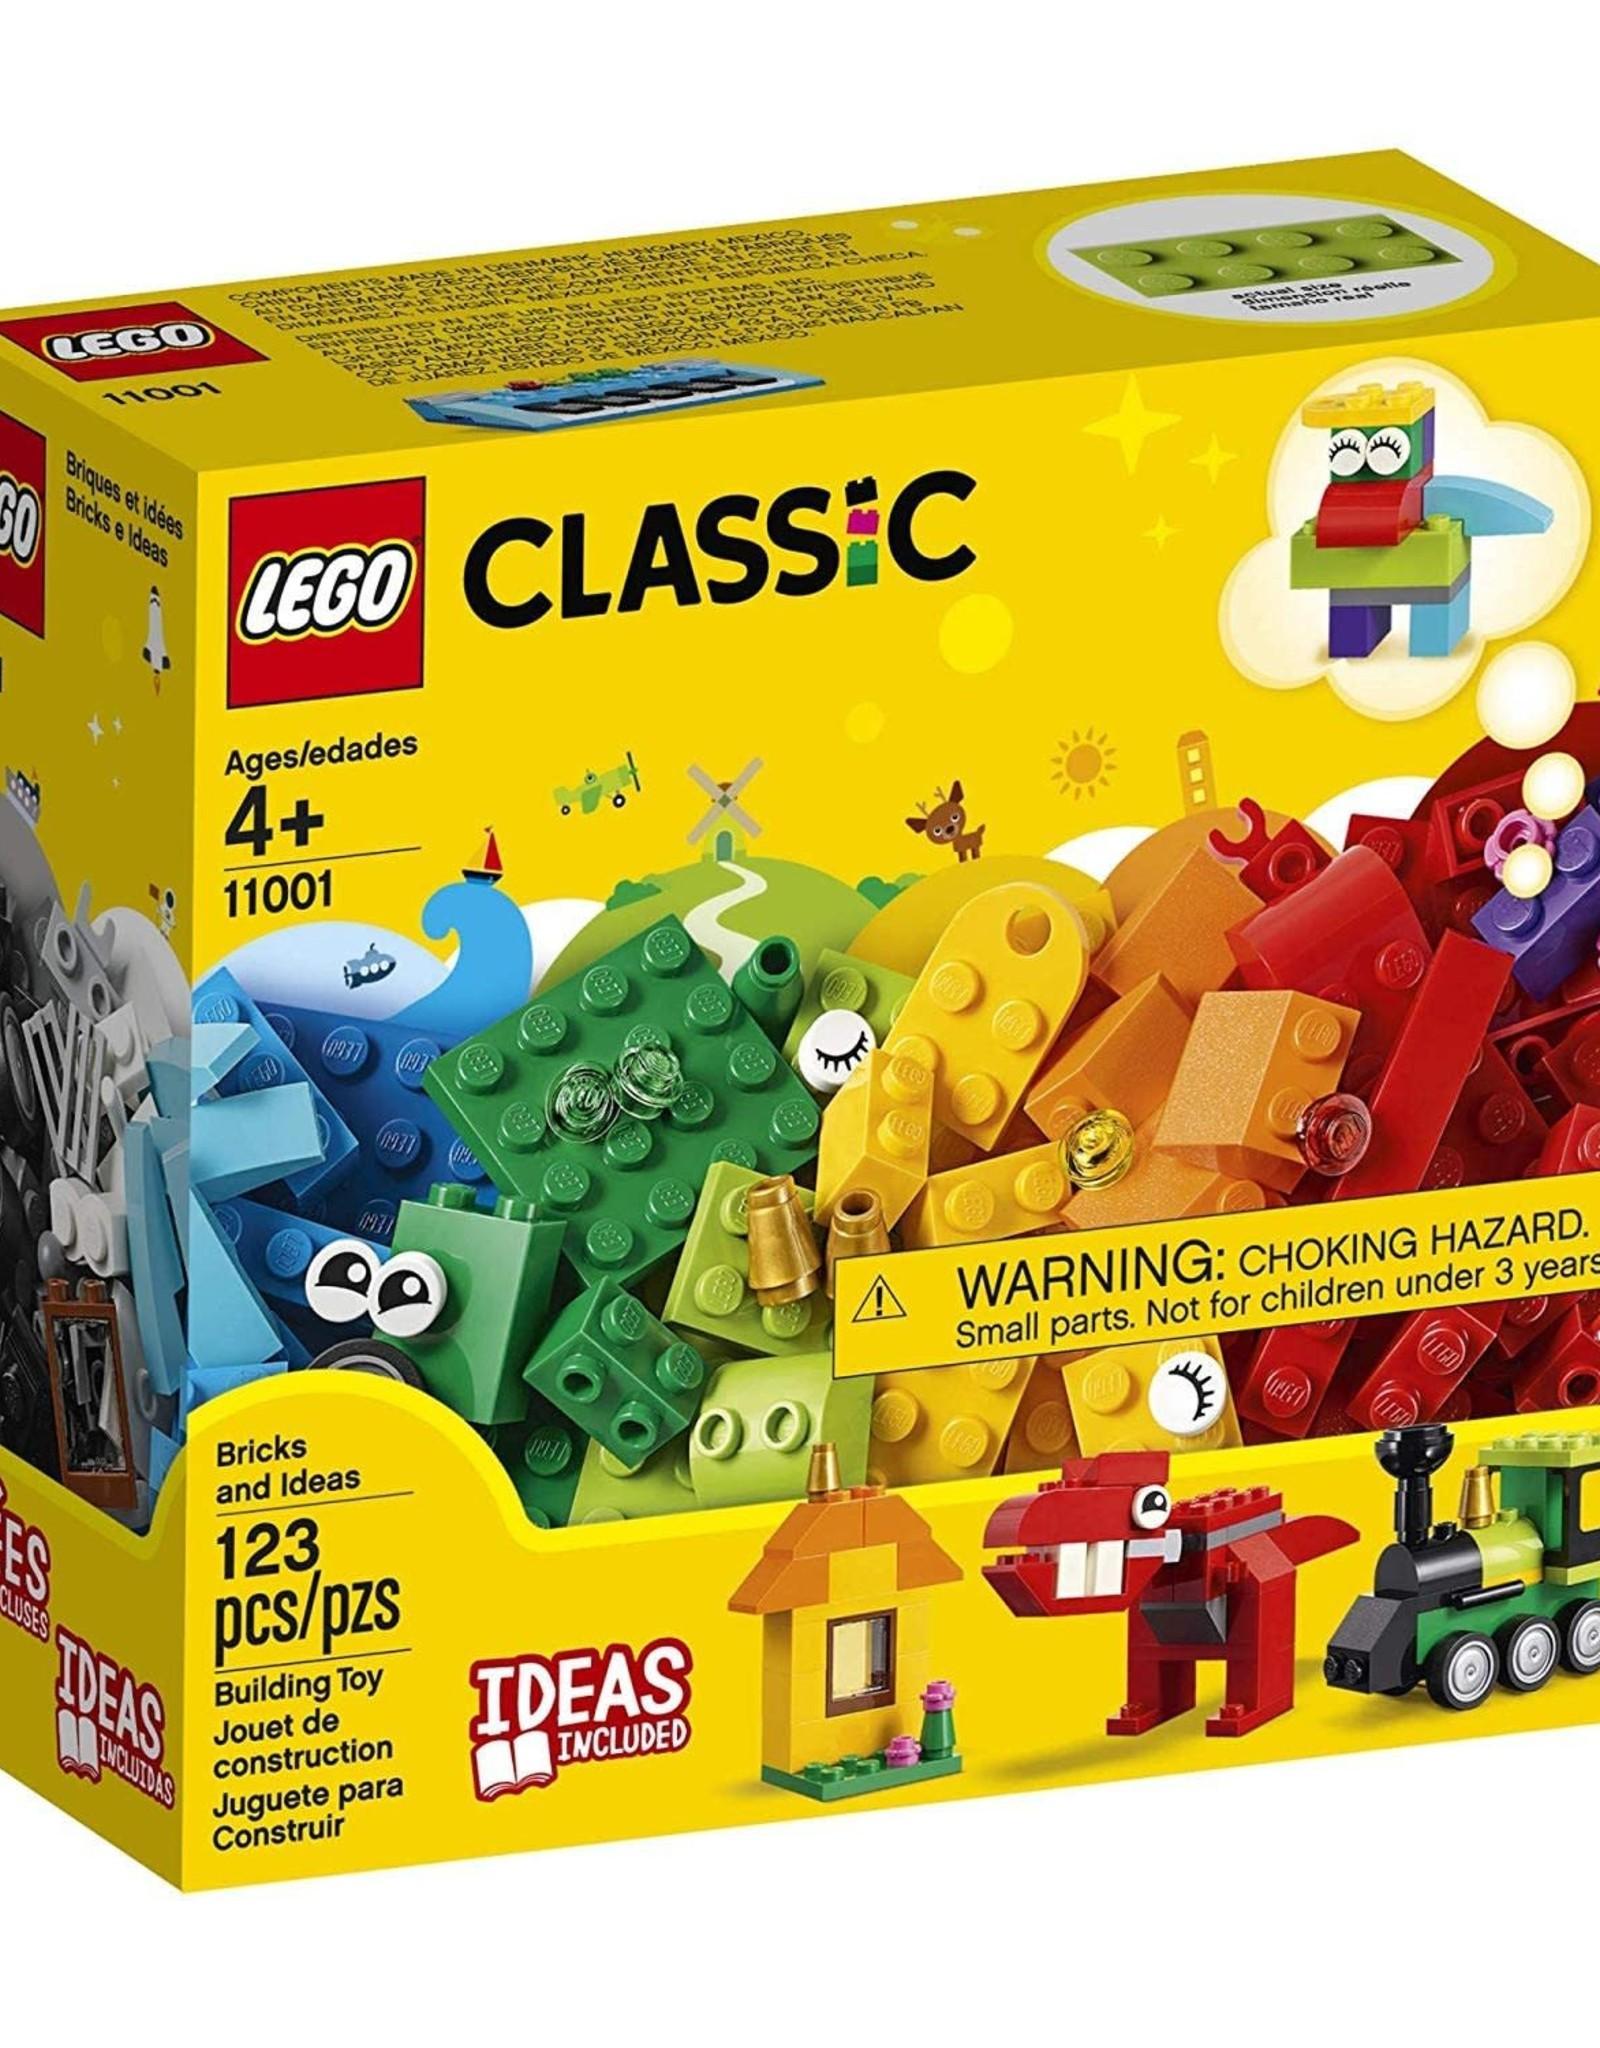 Classic Bricks and Ideas